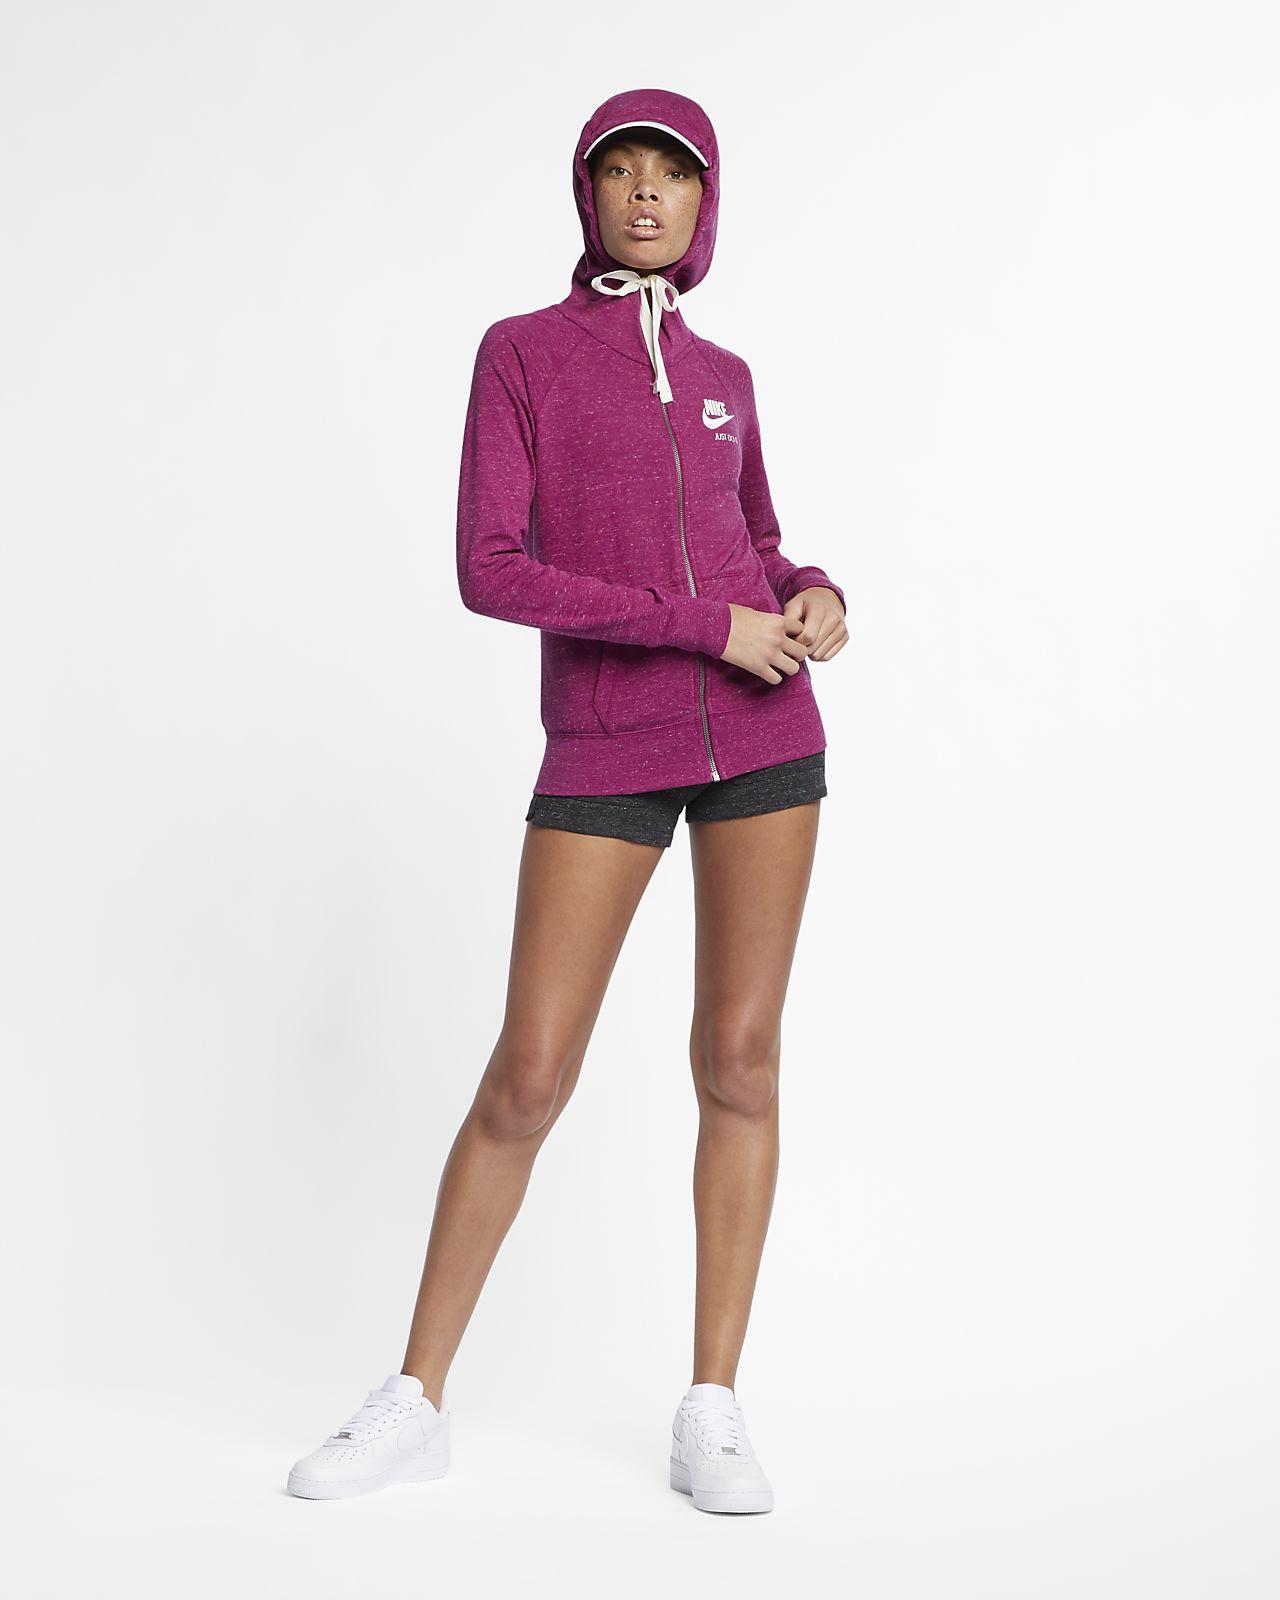 c21ec5057e79 Nike Sportswear Gym Vintage Women s Full-Zip Hoodie. Nike.com